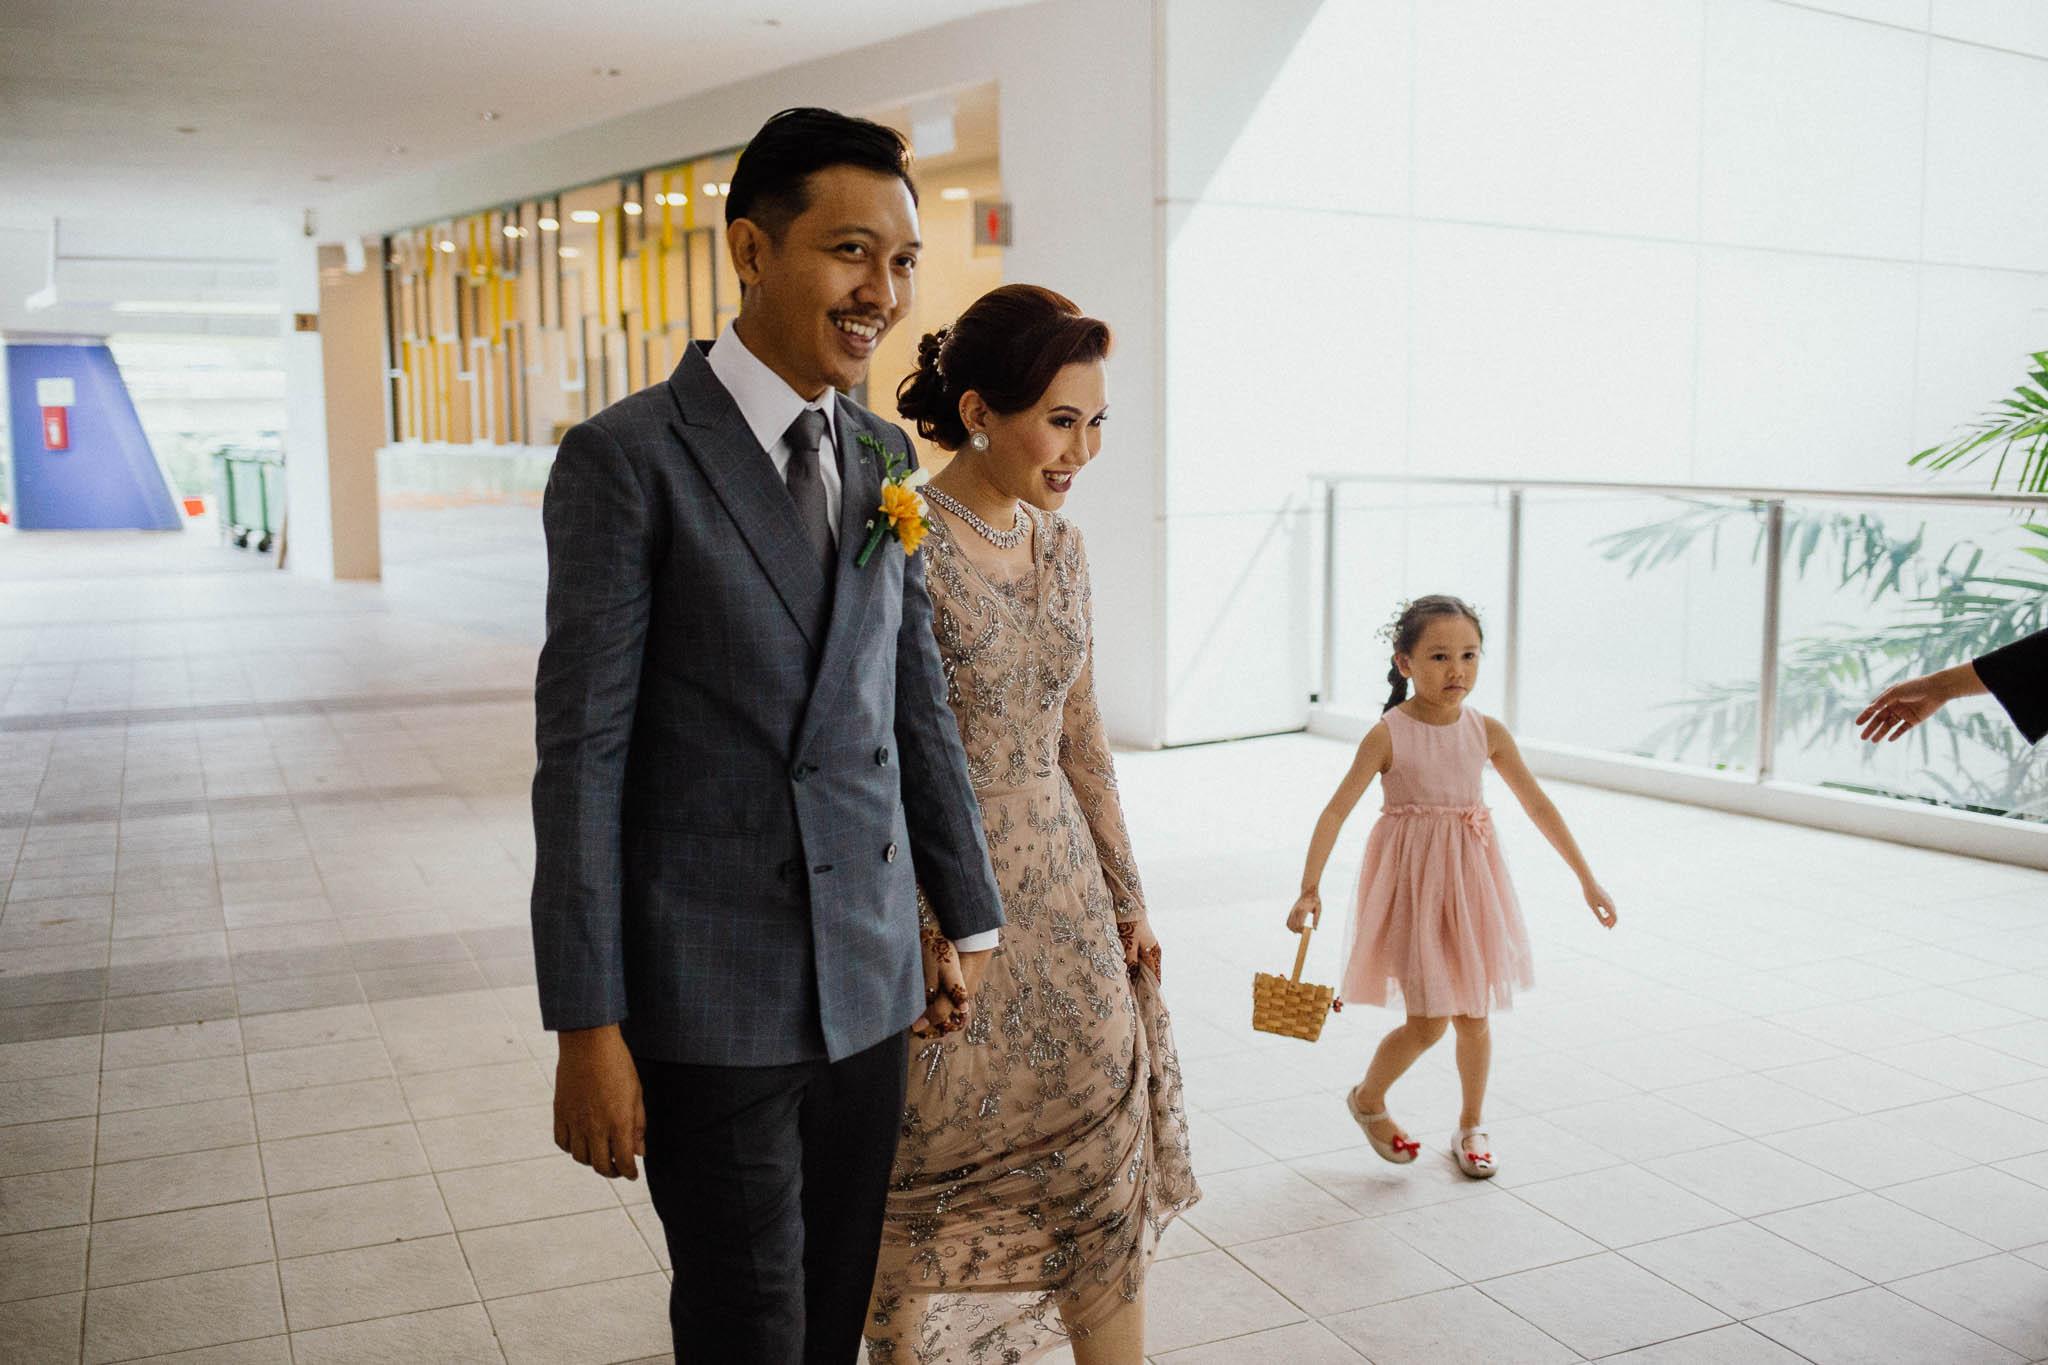 singapore-wedding-photographer-wedding-nufail-addafiq-042.jpg